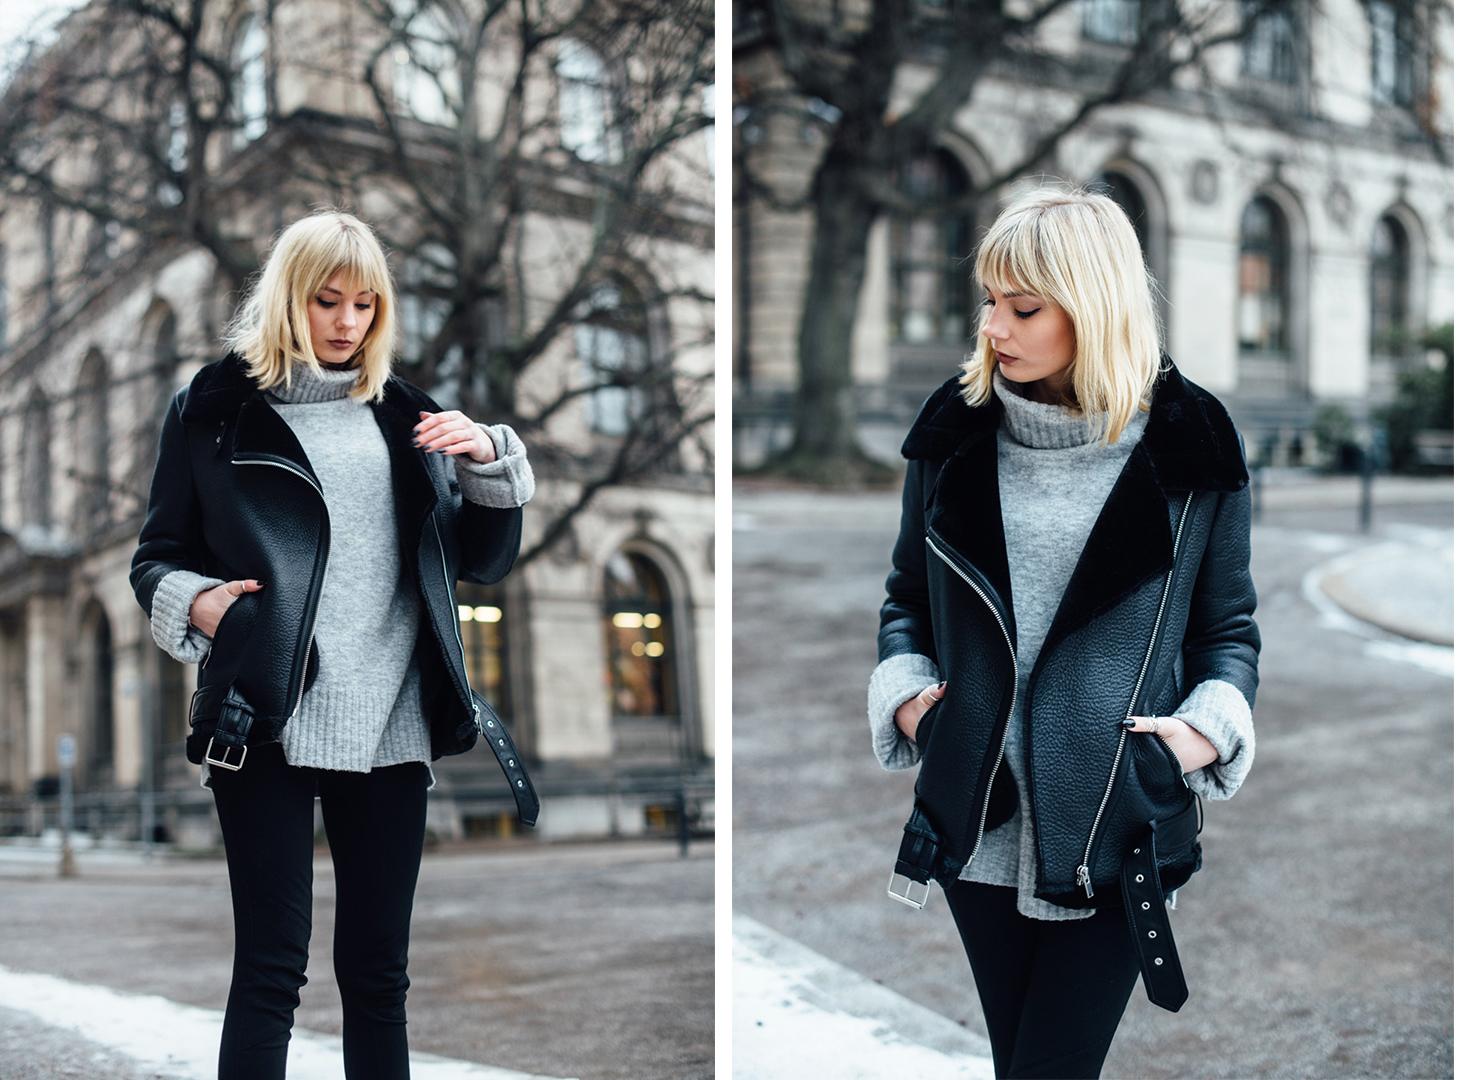 04-Kiamisu-Modeblog-Fashion Week Berlin_Shearling Jacke-collage-2